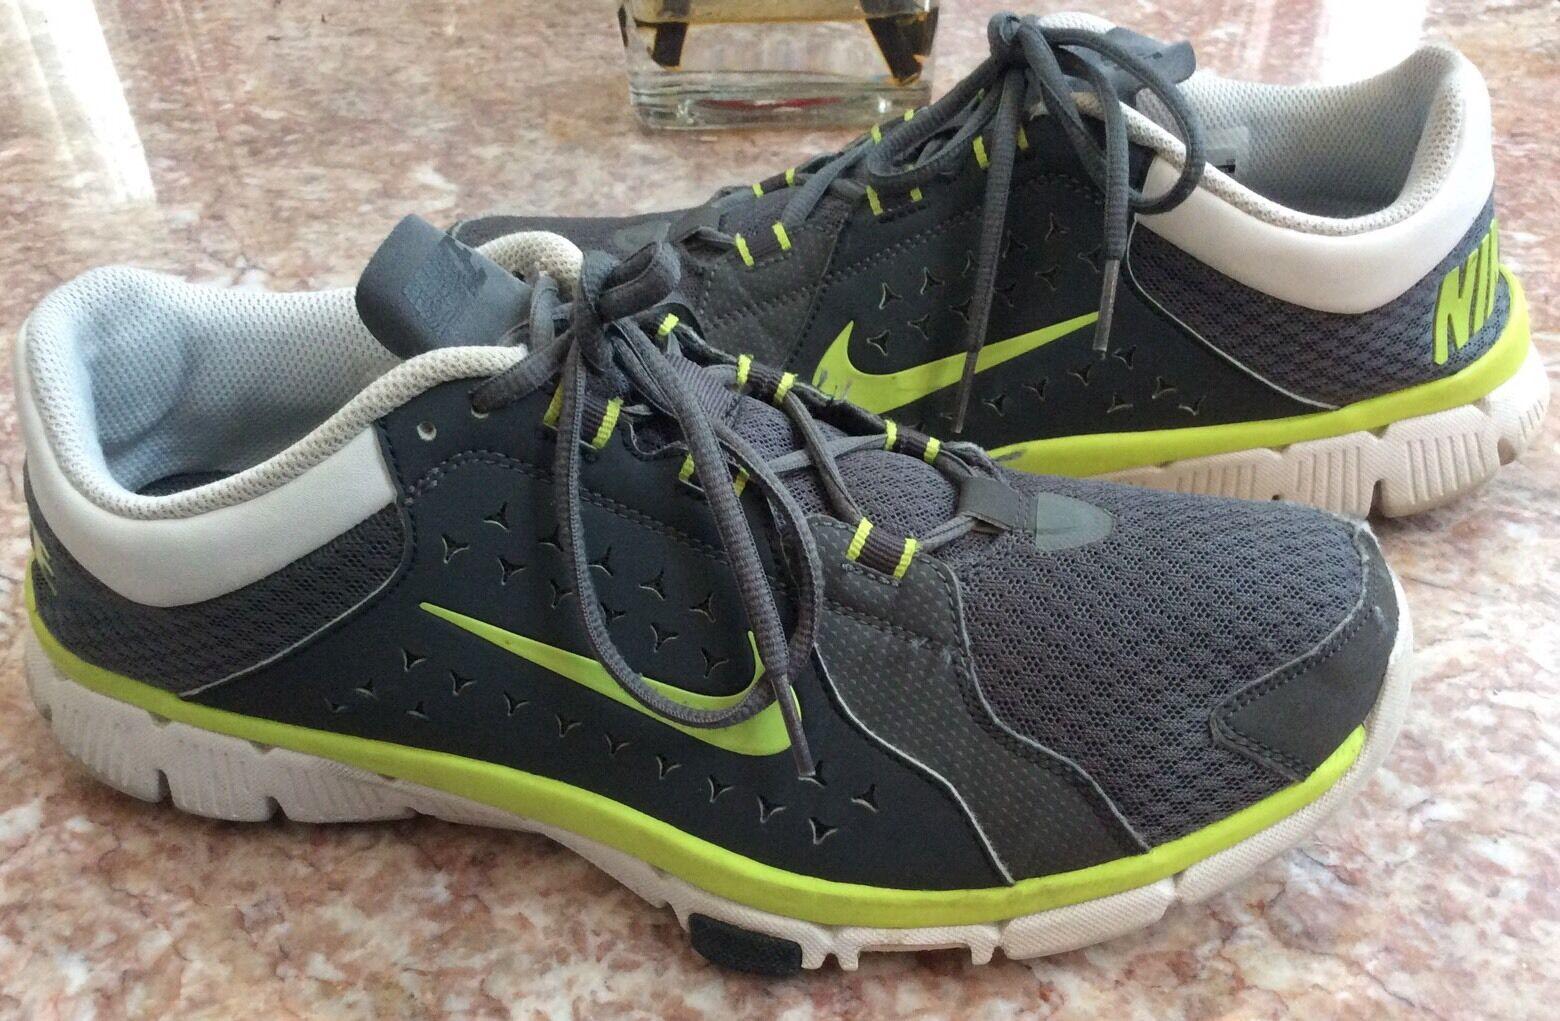 NIKE Flex Supreme Men's TR-Gray/Neon Green Athletic Shoes Sz 11 - 525730-004